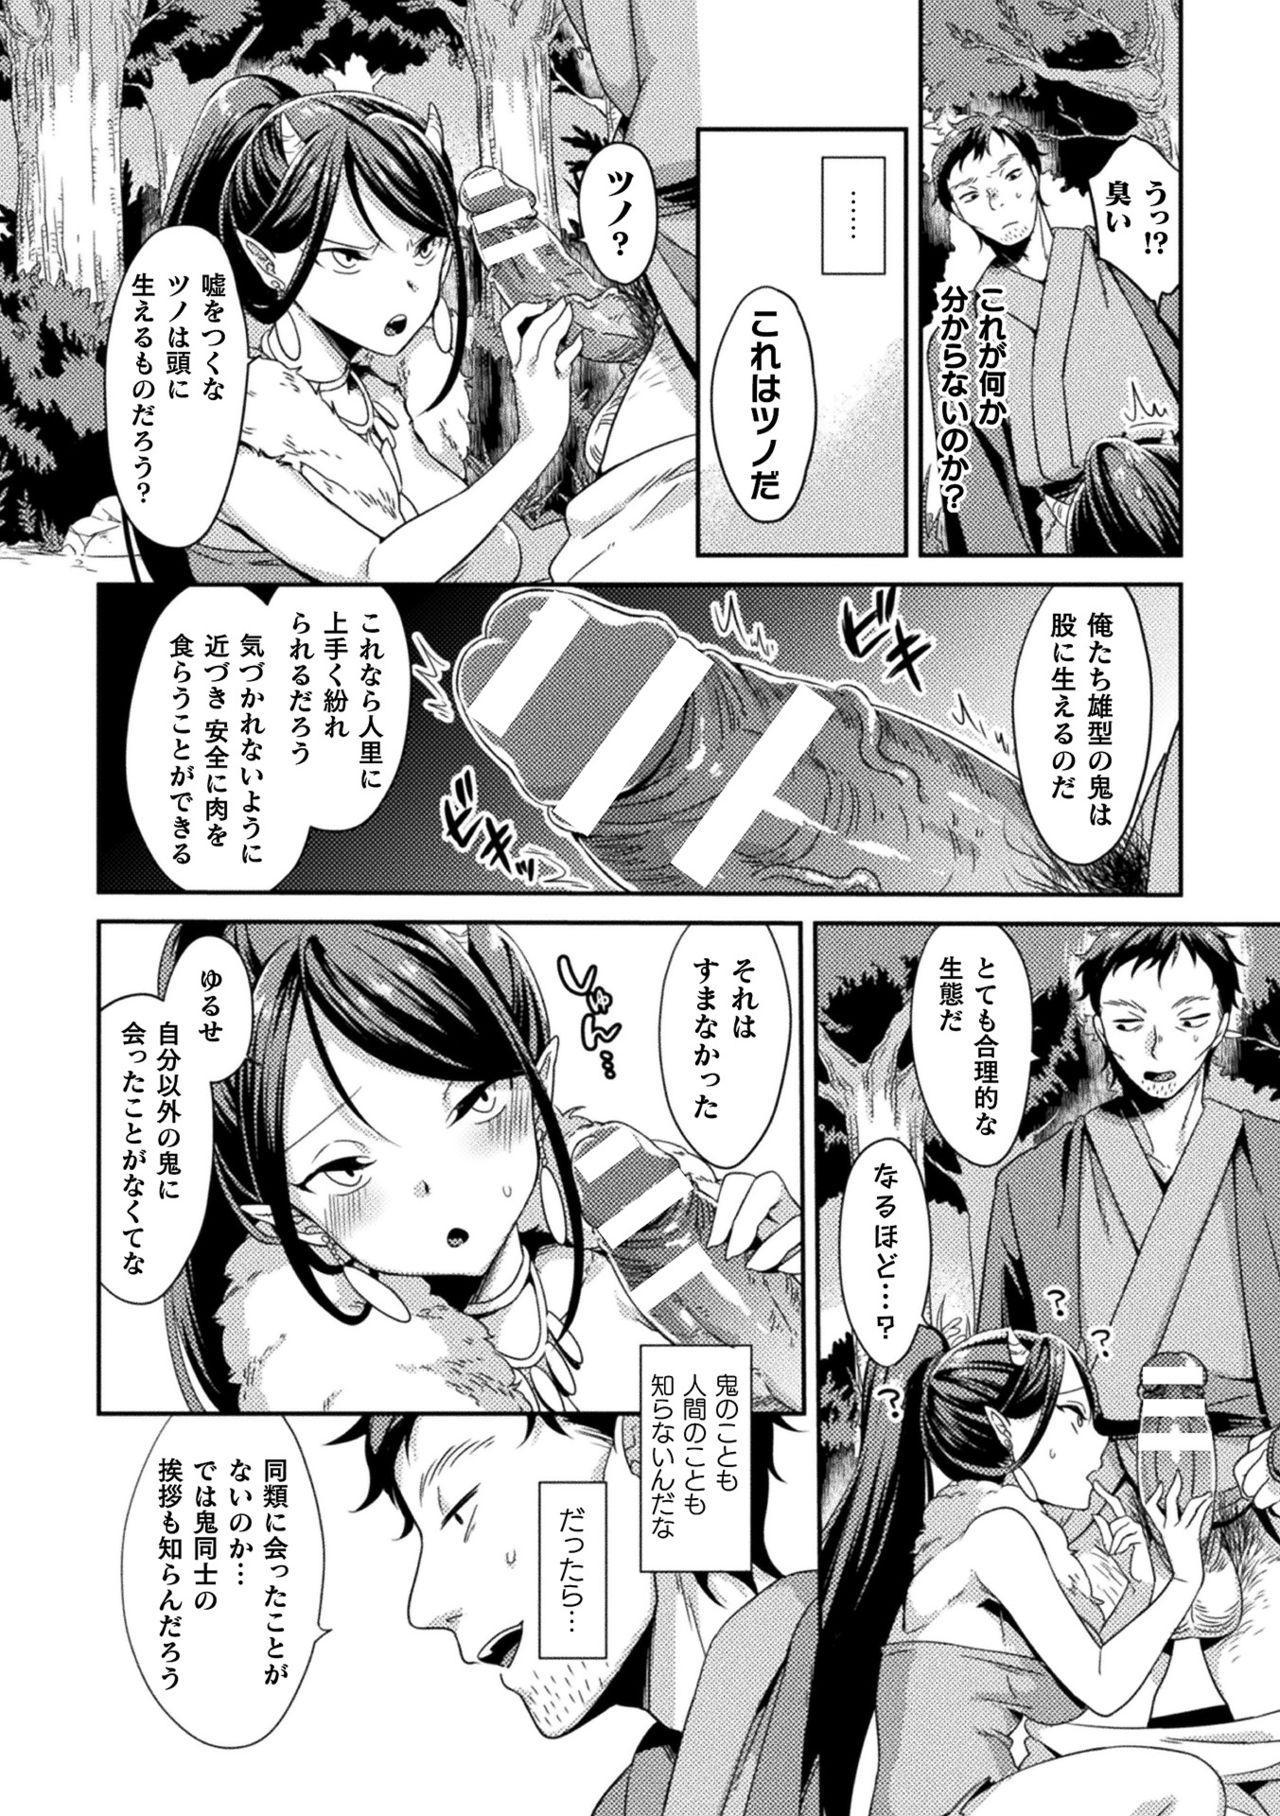 2D Comic Magazine Ero Chishiki 0 na Heroine Damashite Ryoujoku Muchix! Vol. 1 25